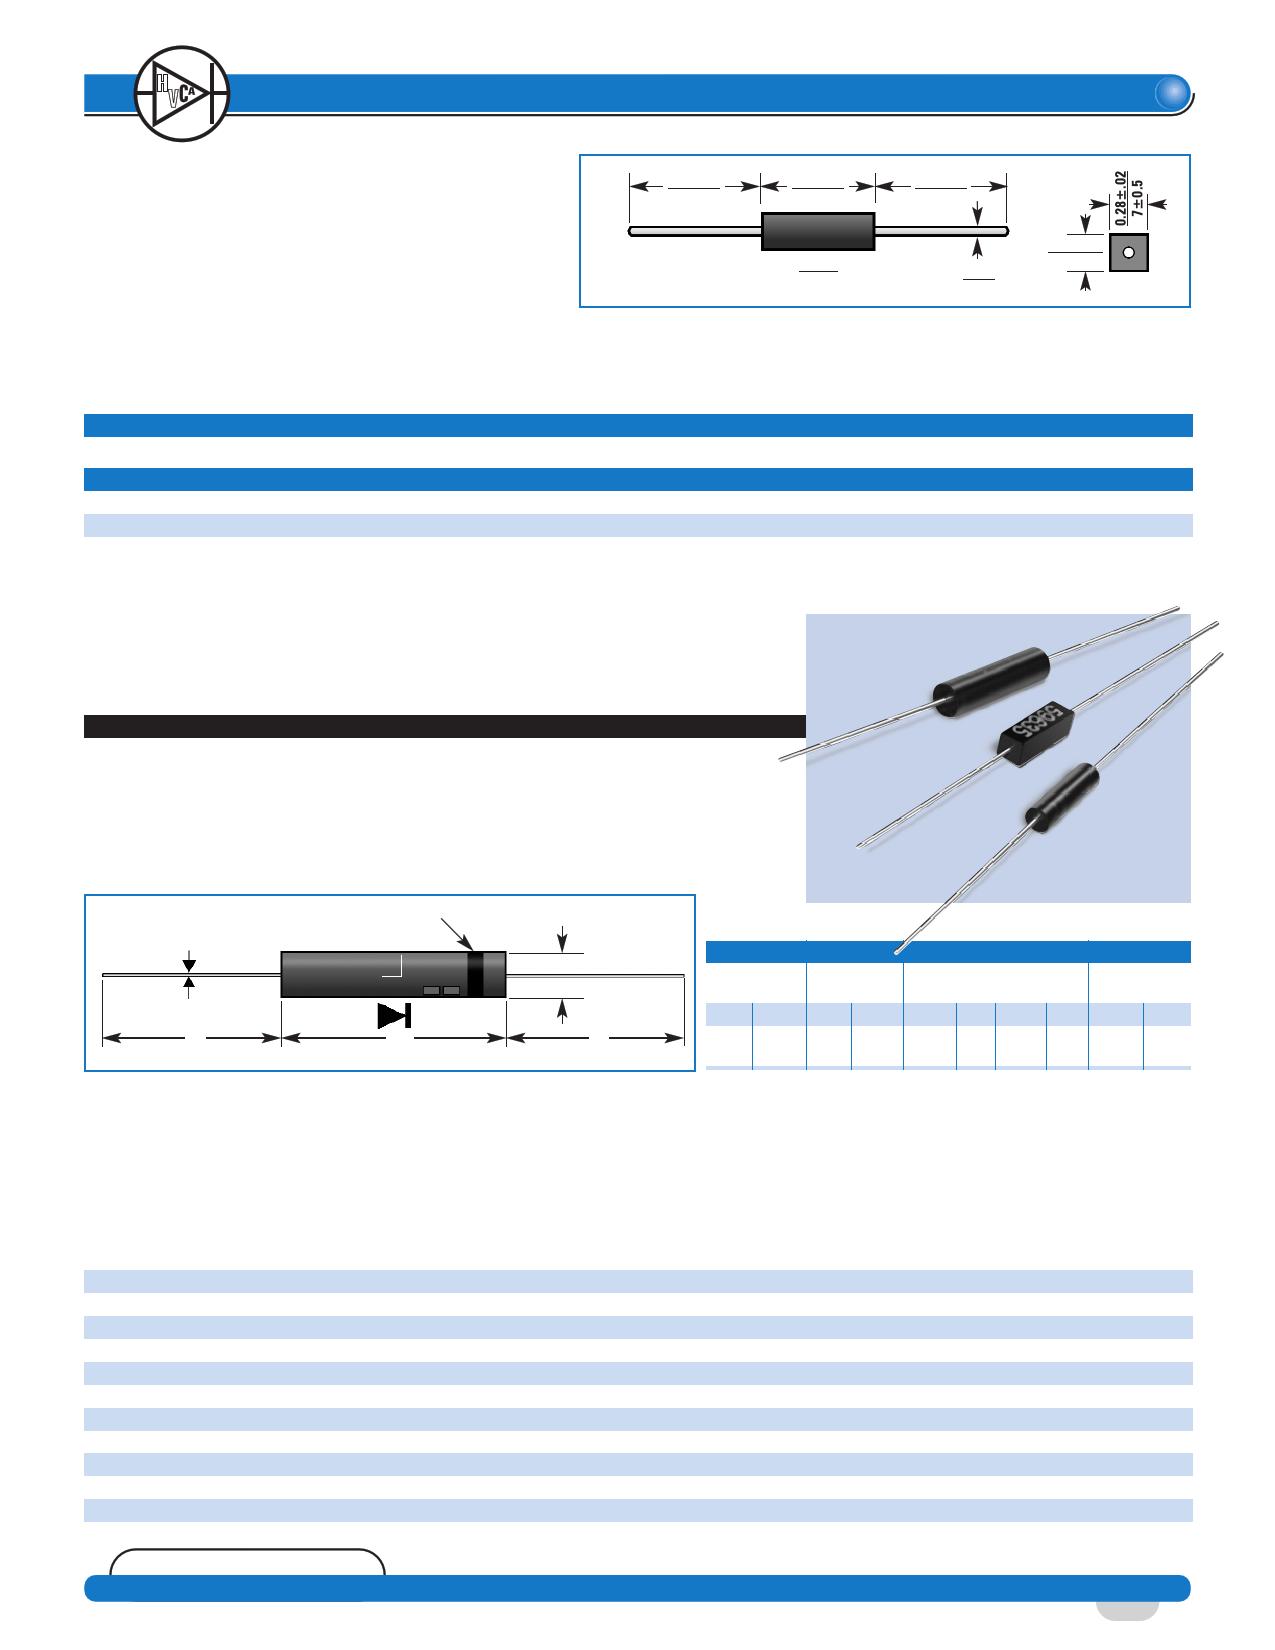 2CL2FL datasheet